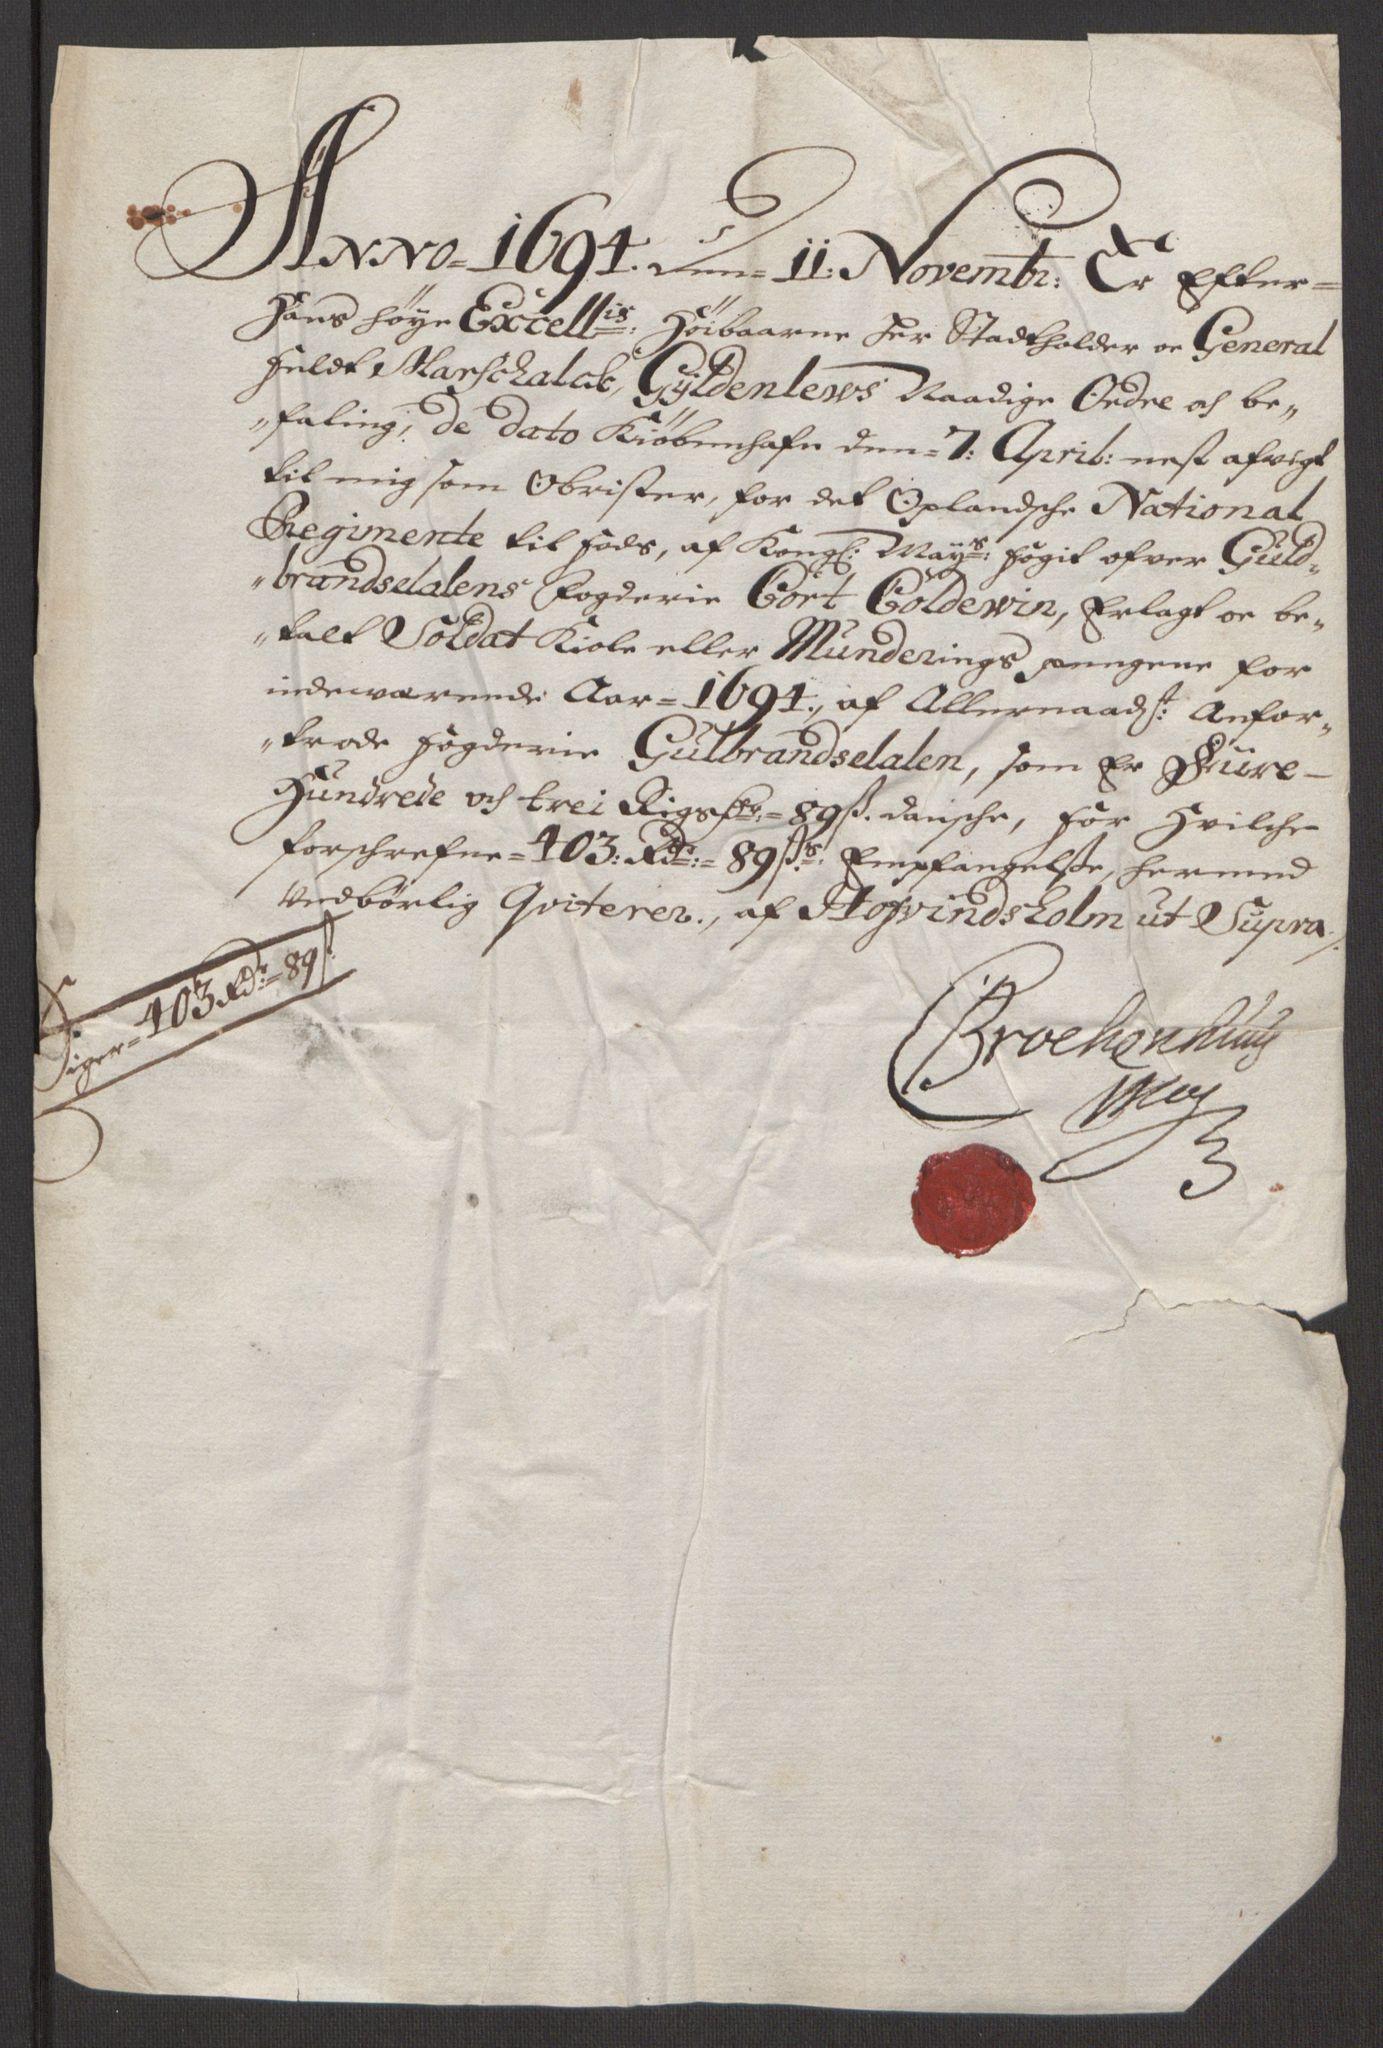 RA, Rentekammeret inntil 1814, Reviderte regnskaper, Fogderegnskap, R17/L1168: Fogderegnskap Gudbrandsdal, 1694, s. 369